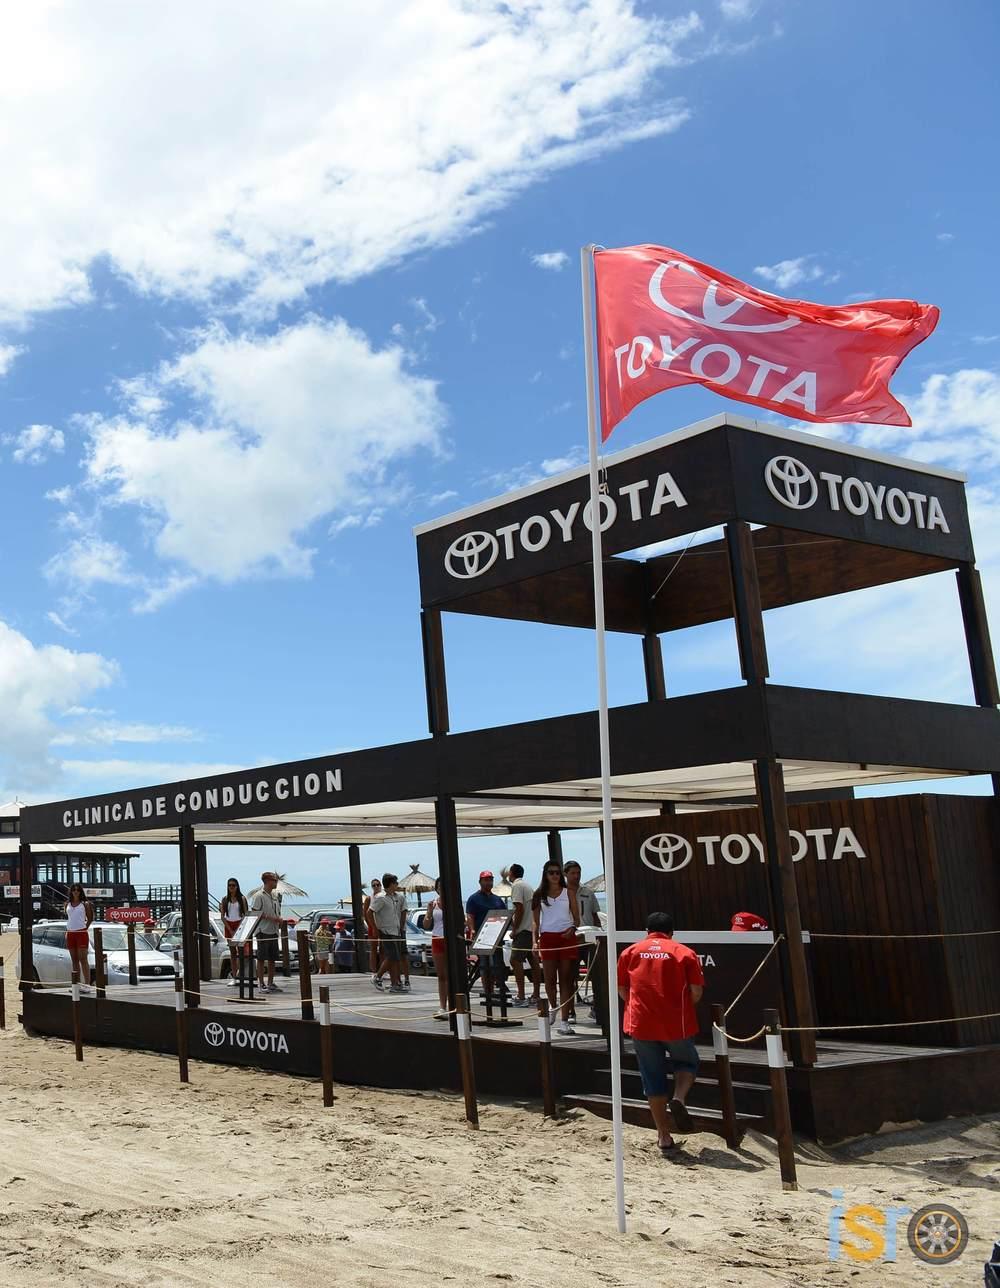 Verano+Toyota+2016+%28Copiar%29